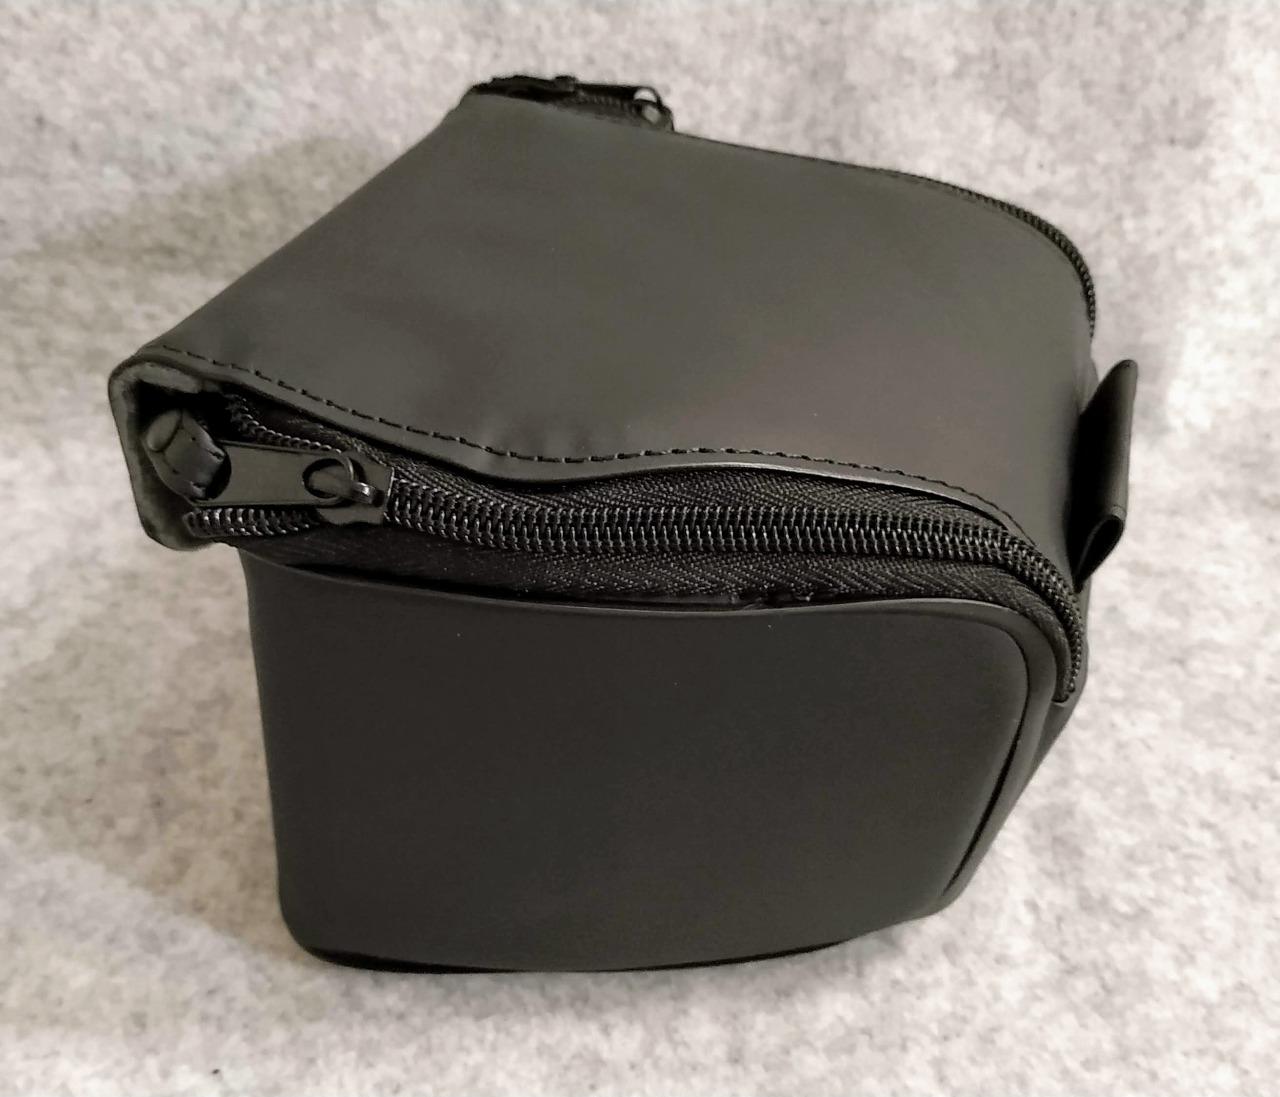 ELECOM 一眼カメラケース ブラック ZSB-SDG011BK COOLPIX B500ケース用 横